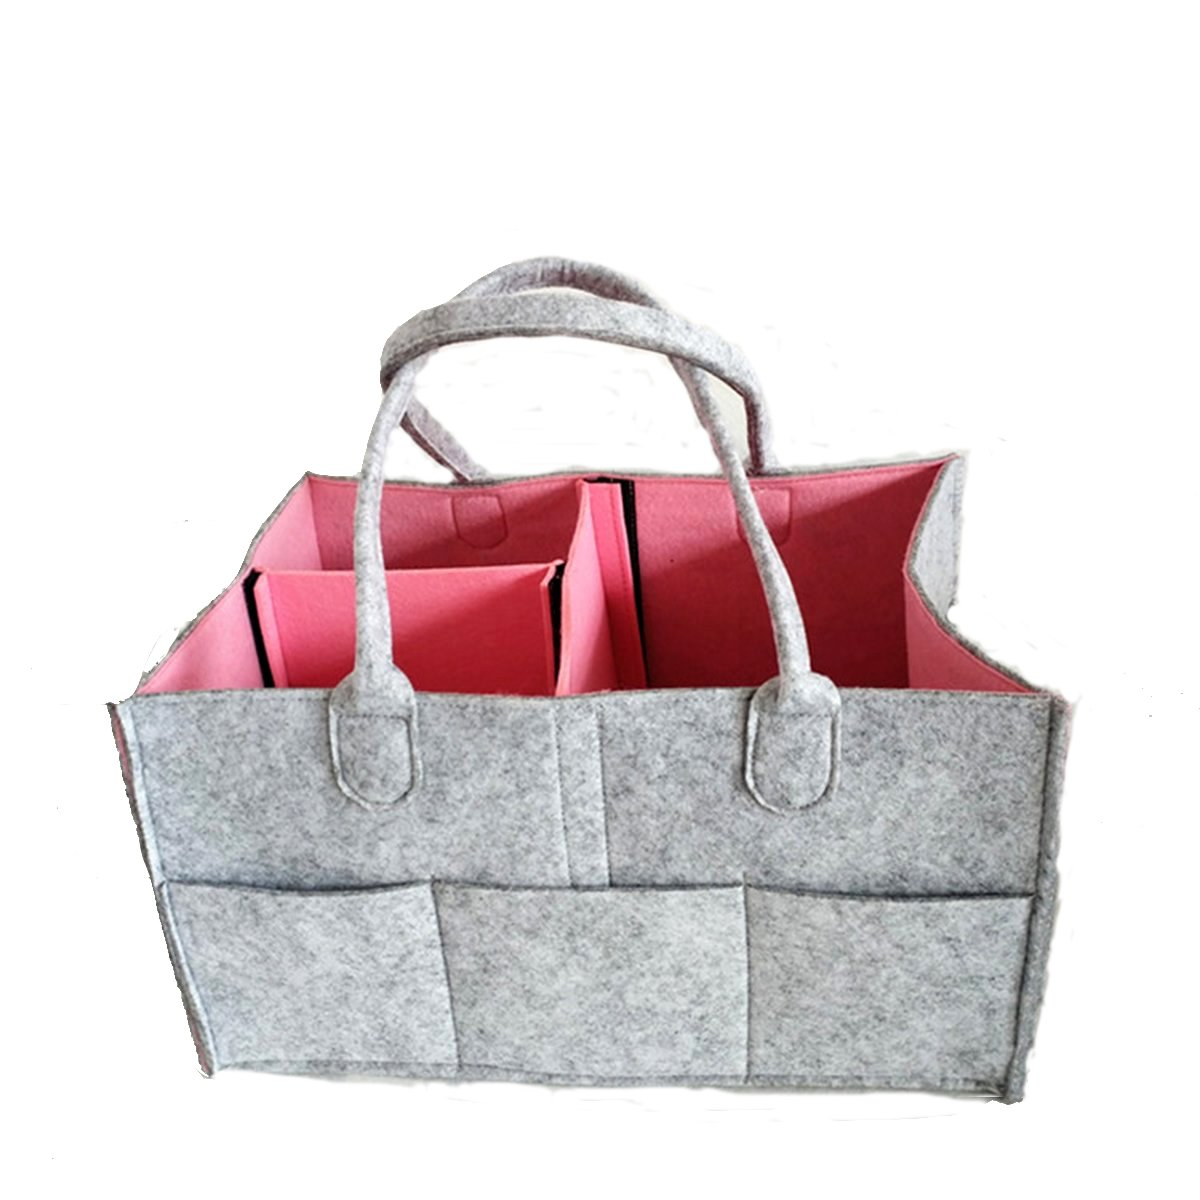 Baby Diaper Organizer, Nappy Organizer Portable Caddy Organizer Baby Wipes Bag Nappy Organizer Nappy Storage Bag (Dark Grey+ Pink) Pakly